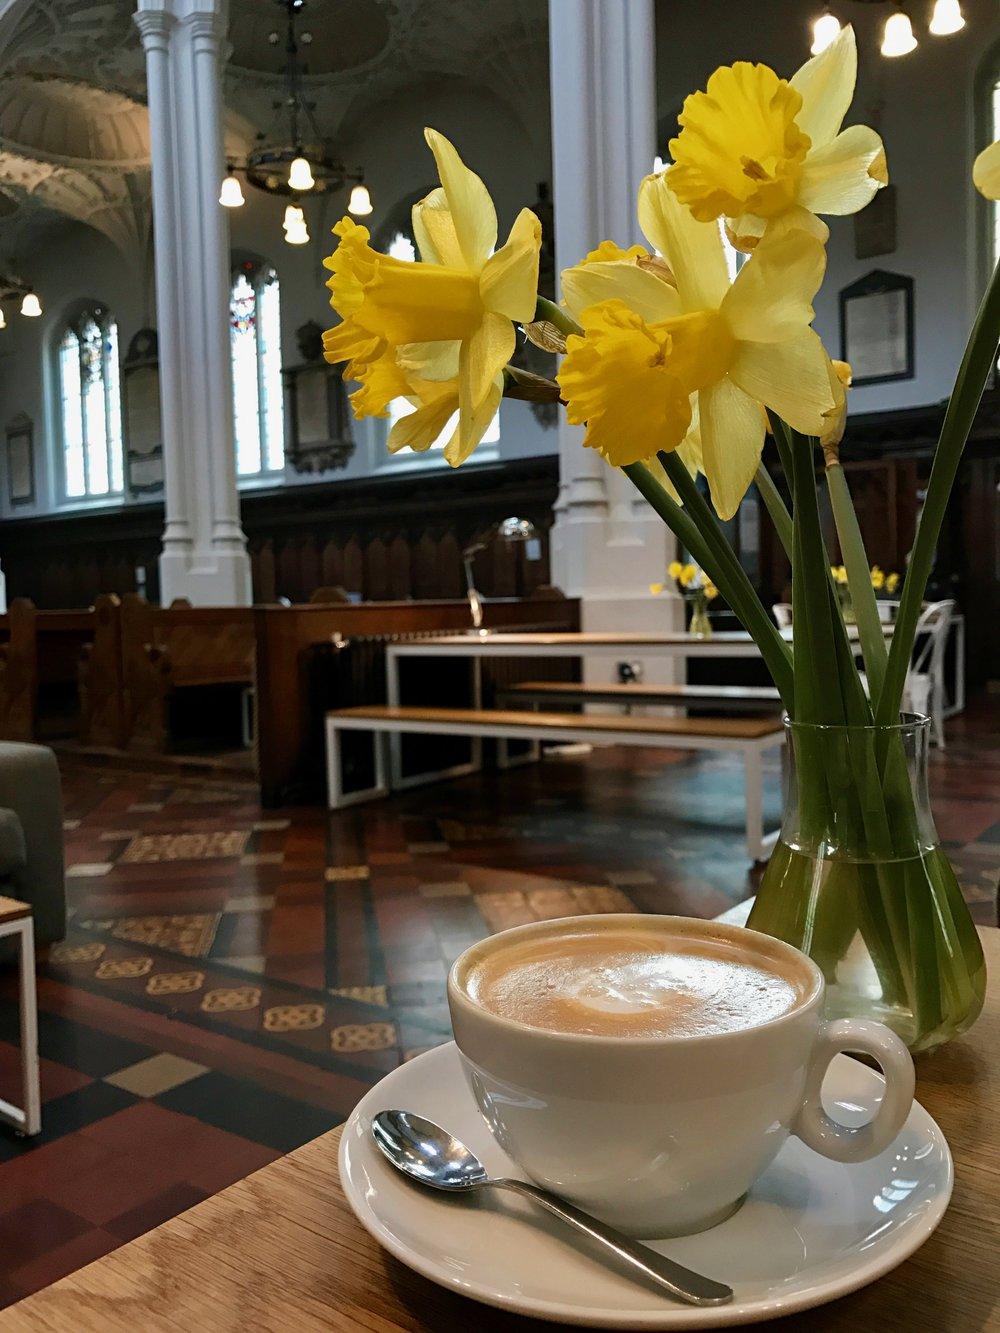 Host Cafe The City (c) when i've got time_9562.jpg